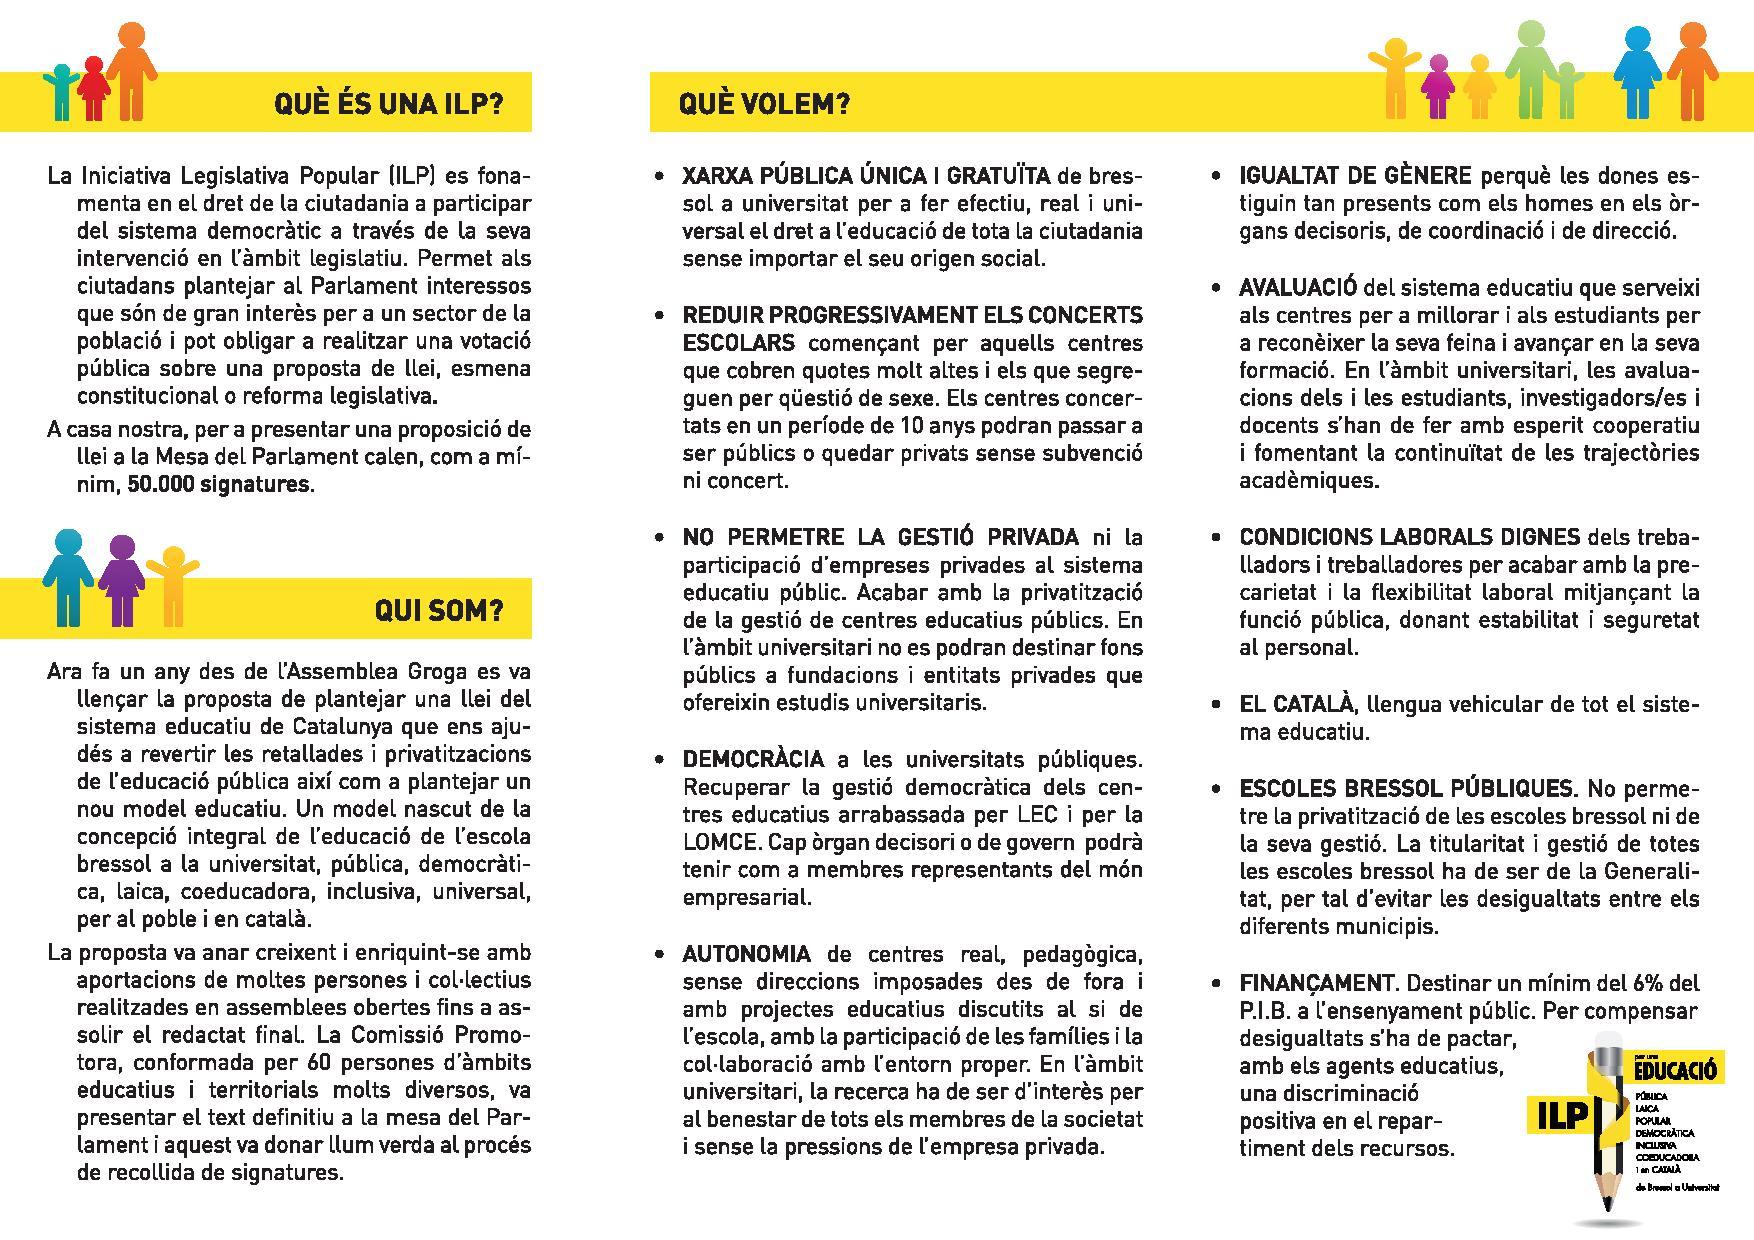 ILPeducacio-Triptic-page-002